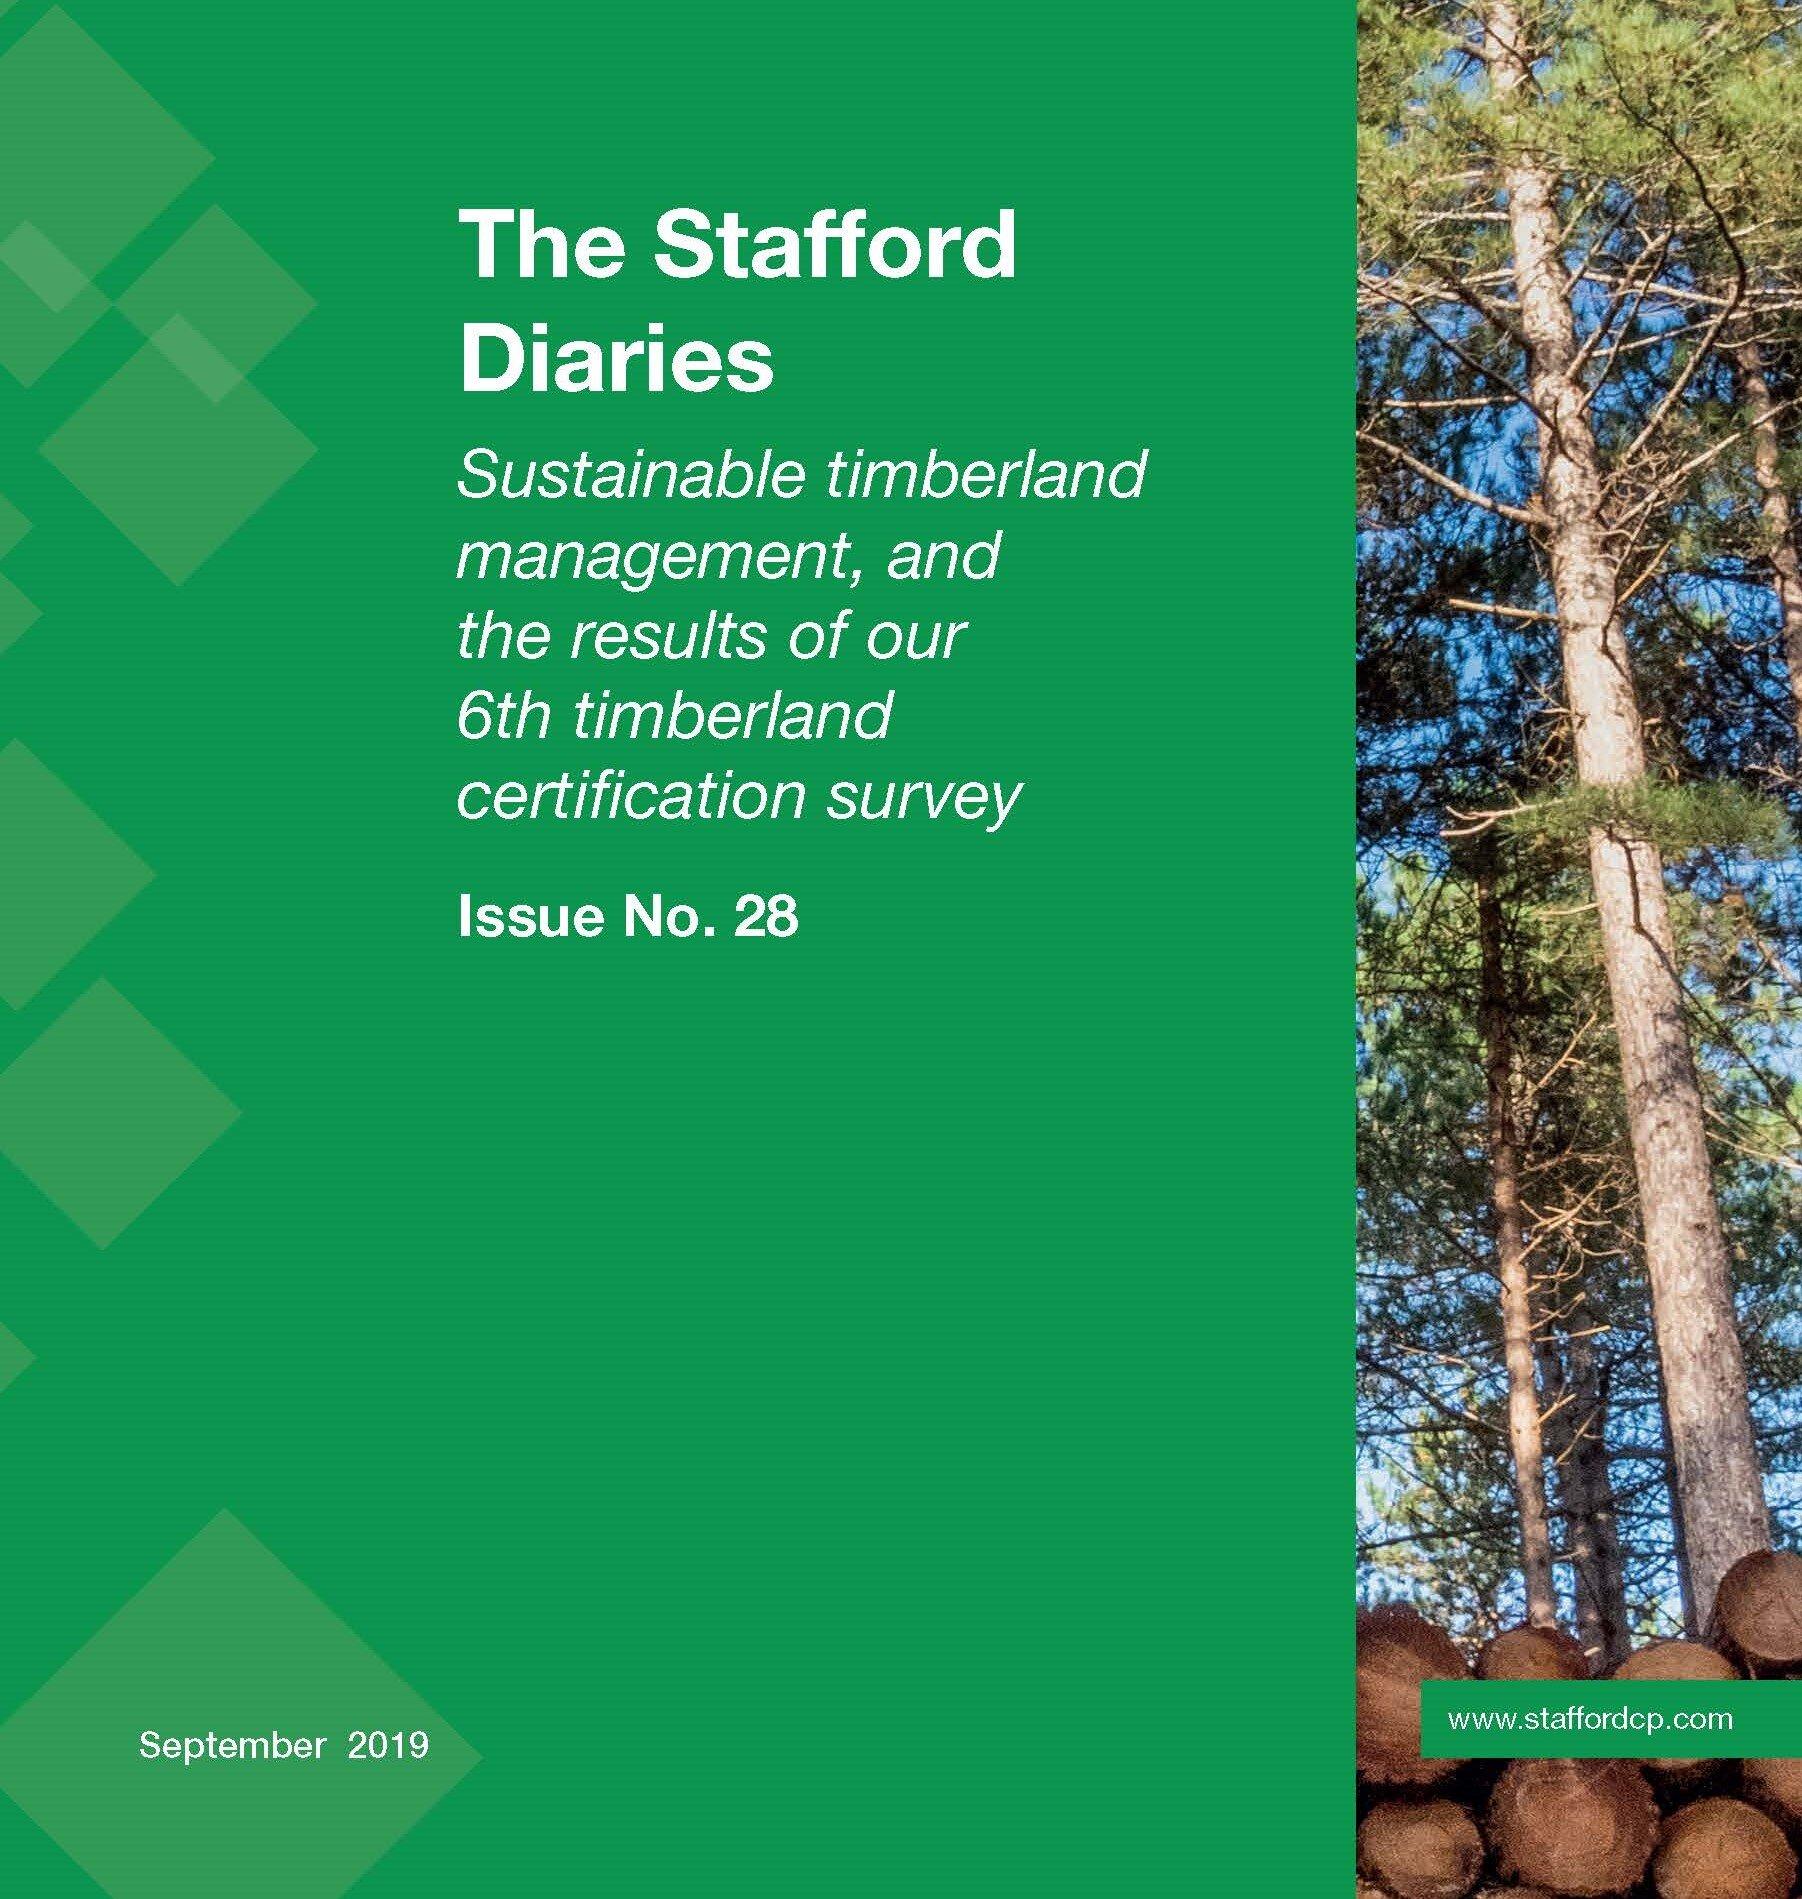 Stafford Diaries 28_Timberland.jpg